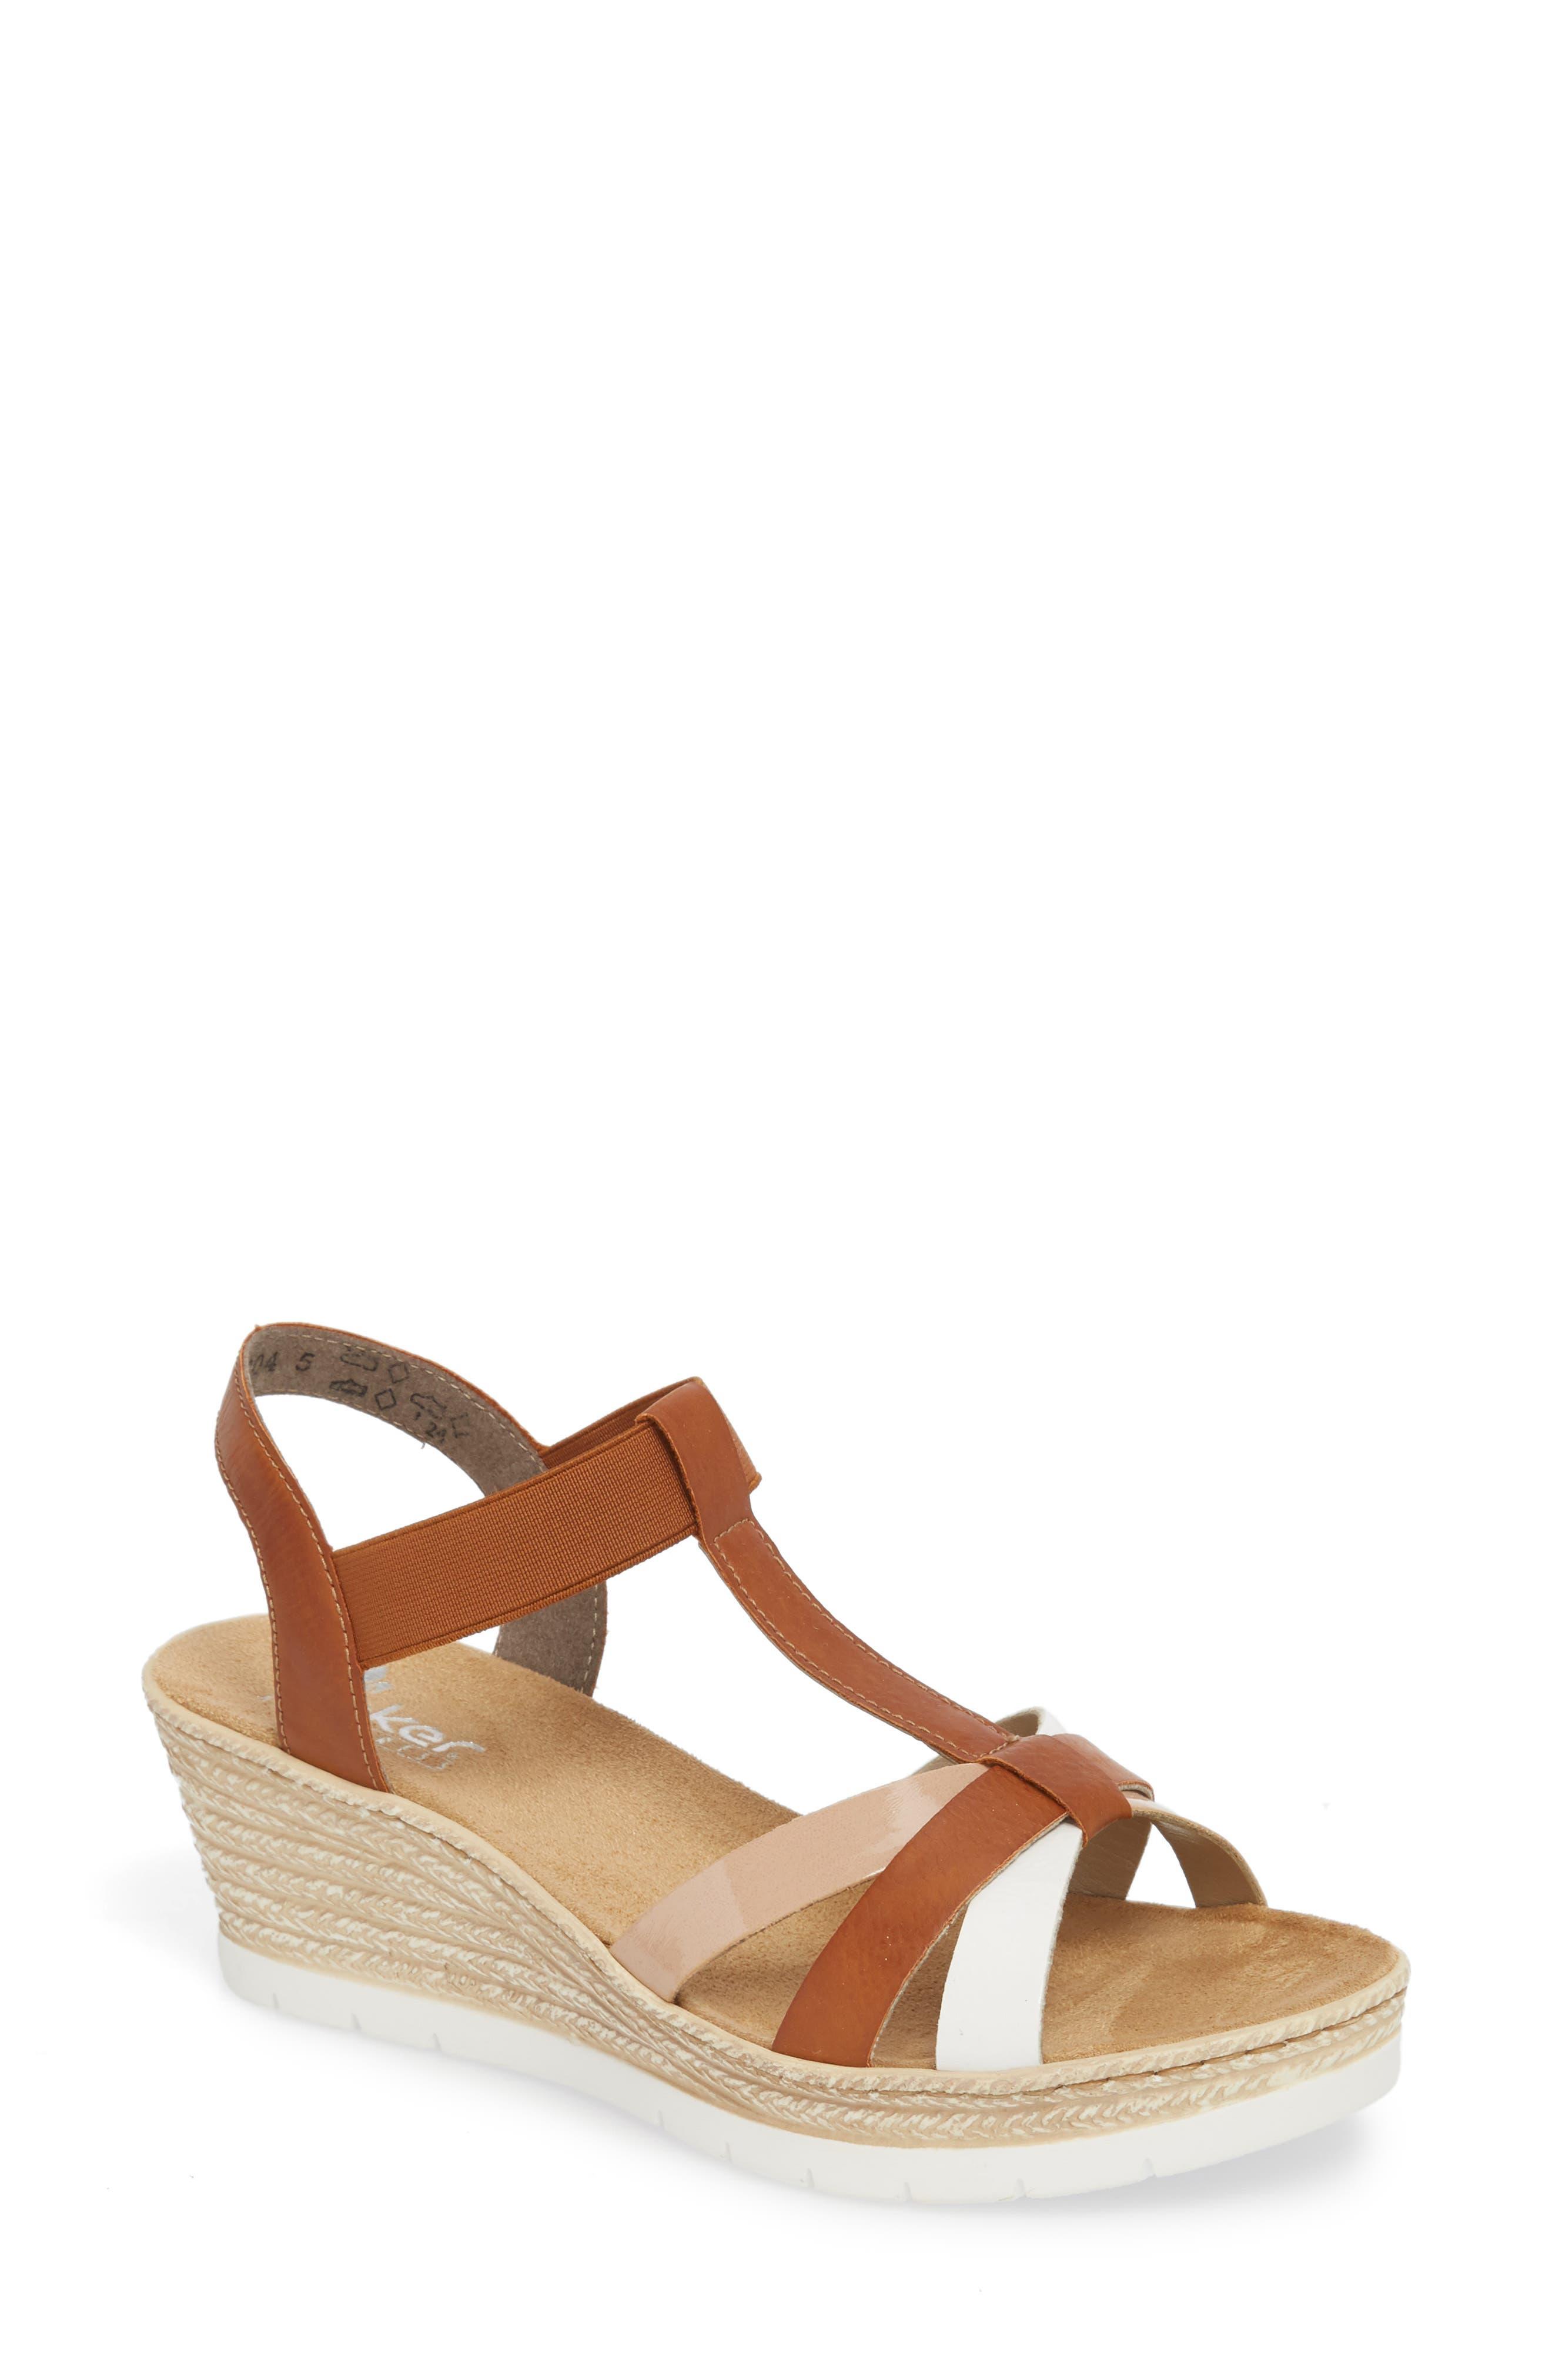 RIEKER ANTISTRESS Fanni 95 Espadrille Wedge Sandal, Main, color, BIANCO/ CAYENNE